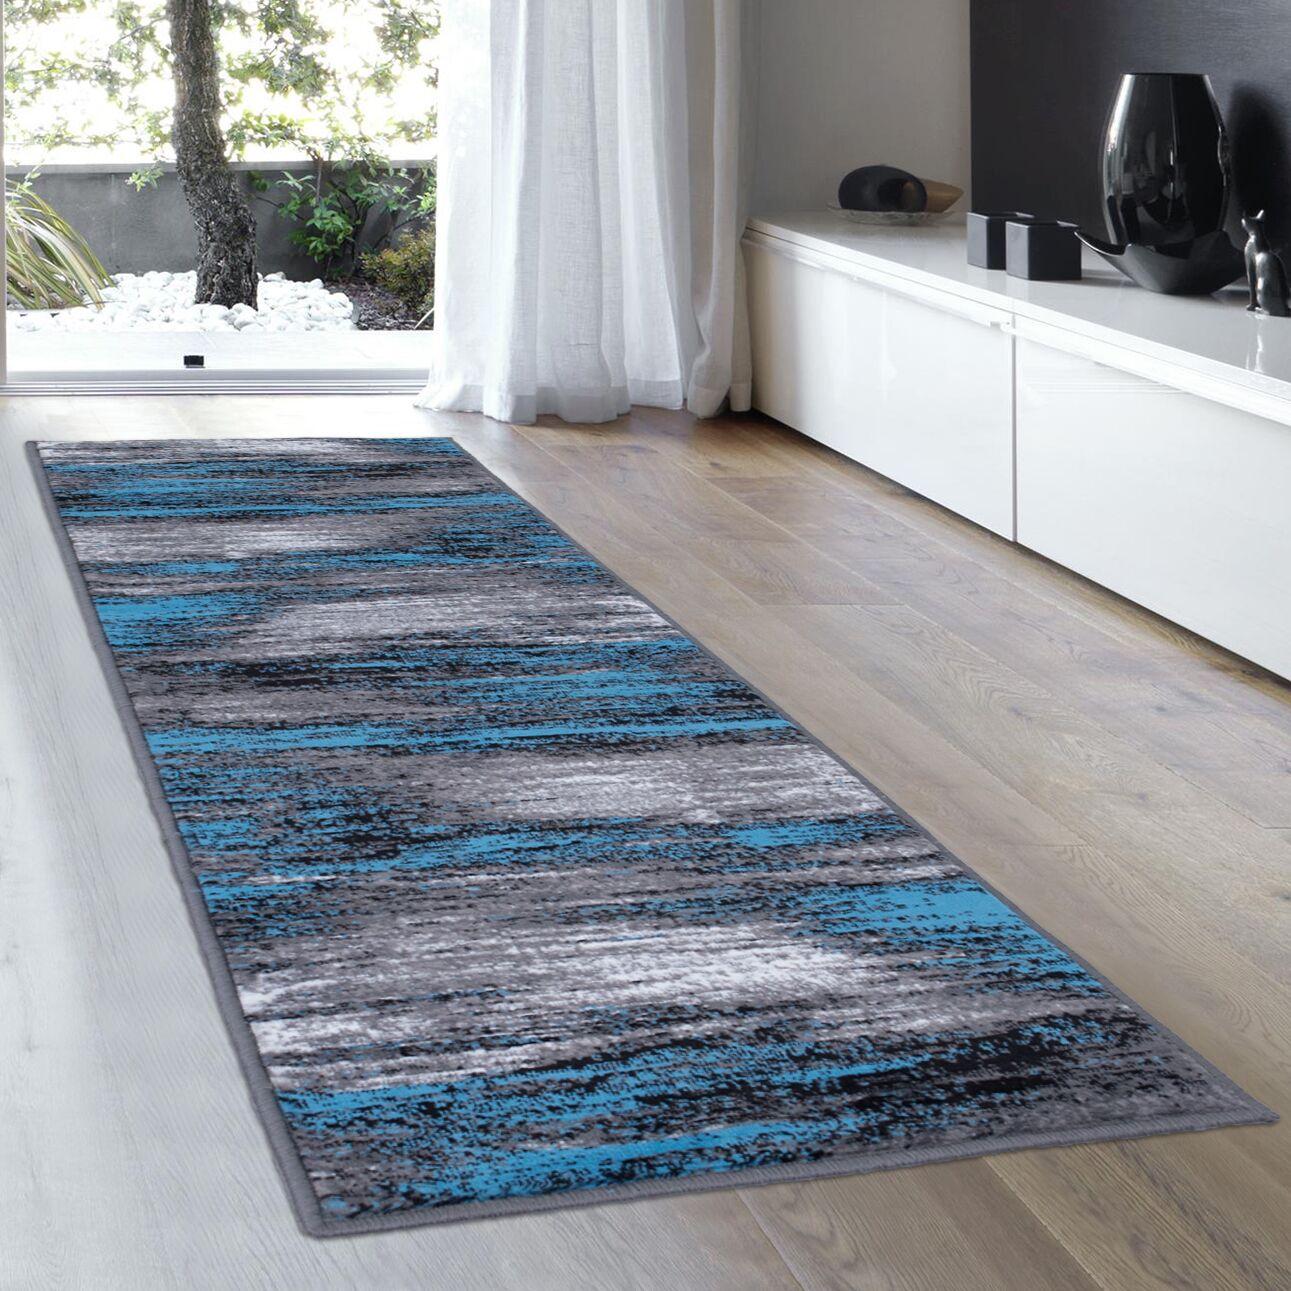 Blue Area Rug Rug Size: 5' x 6'11